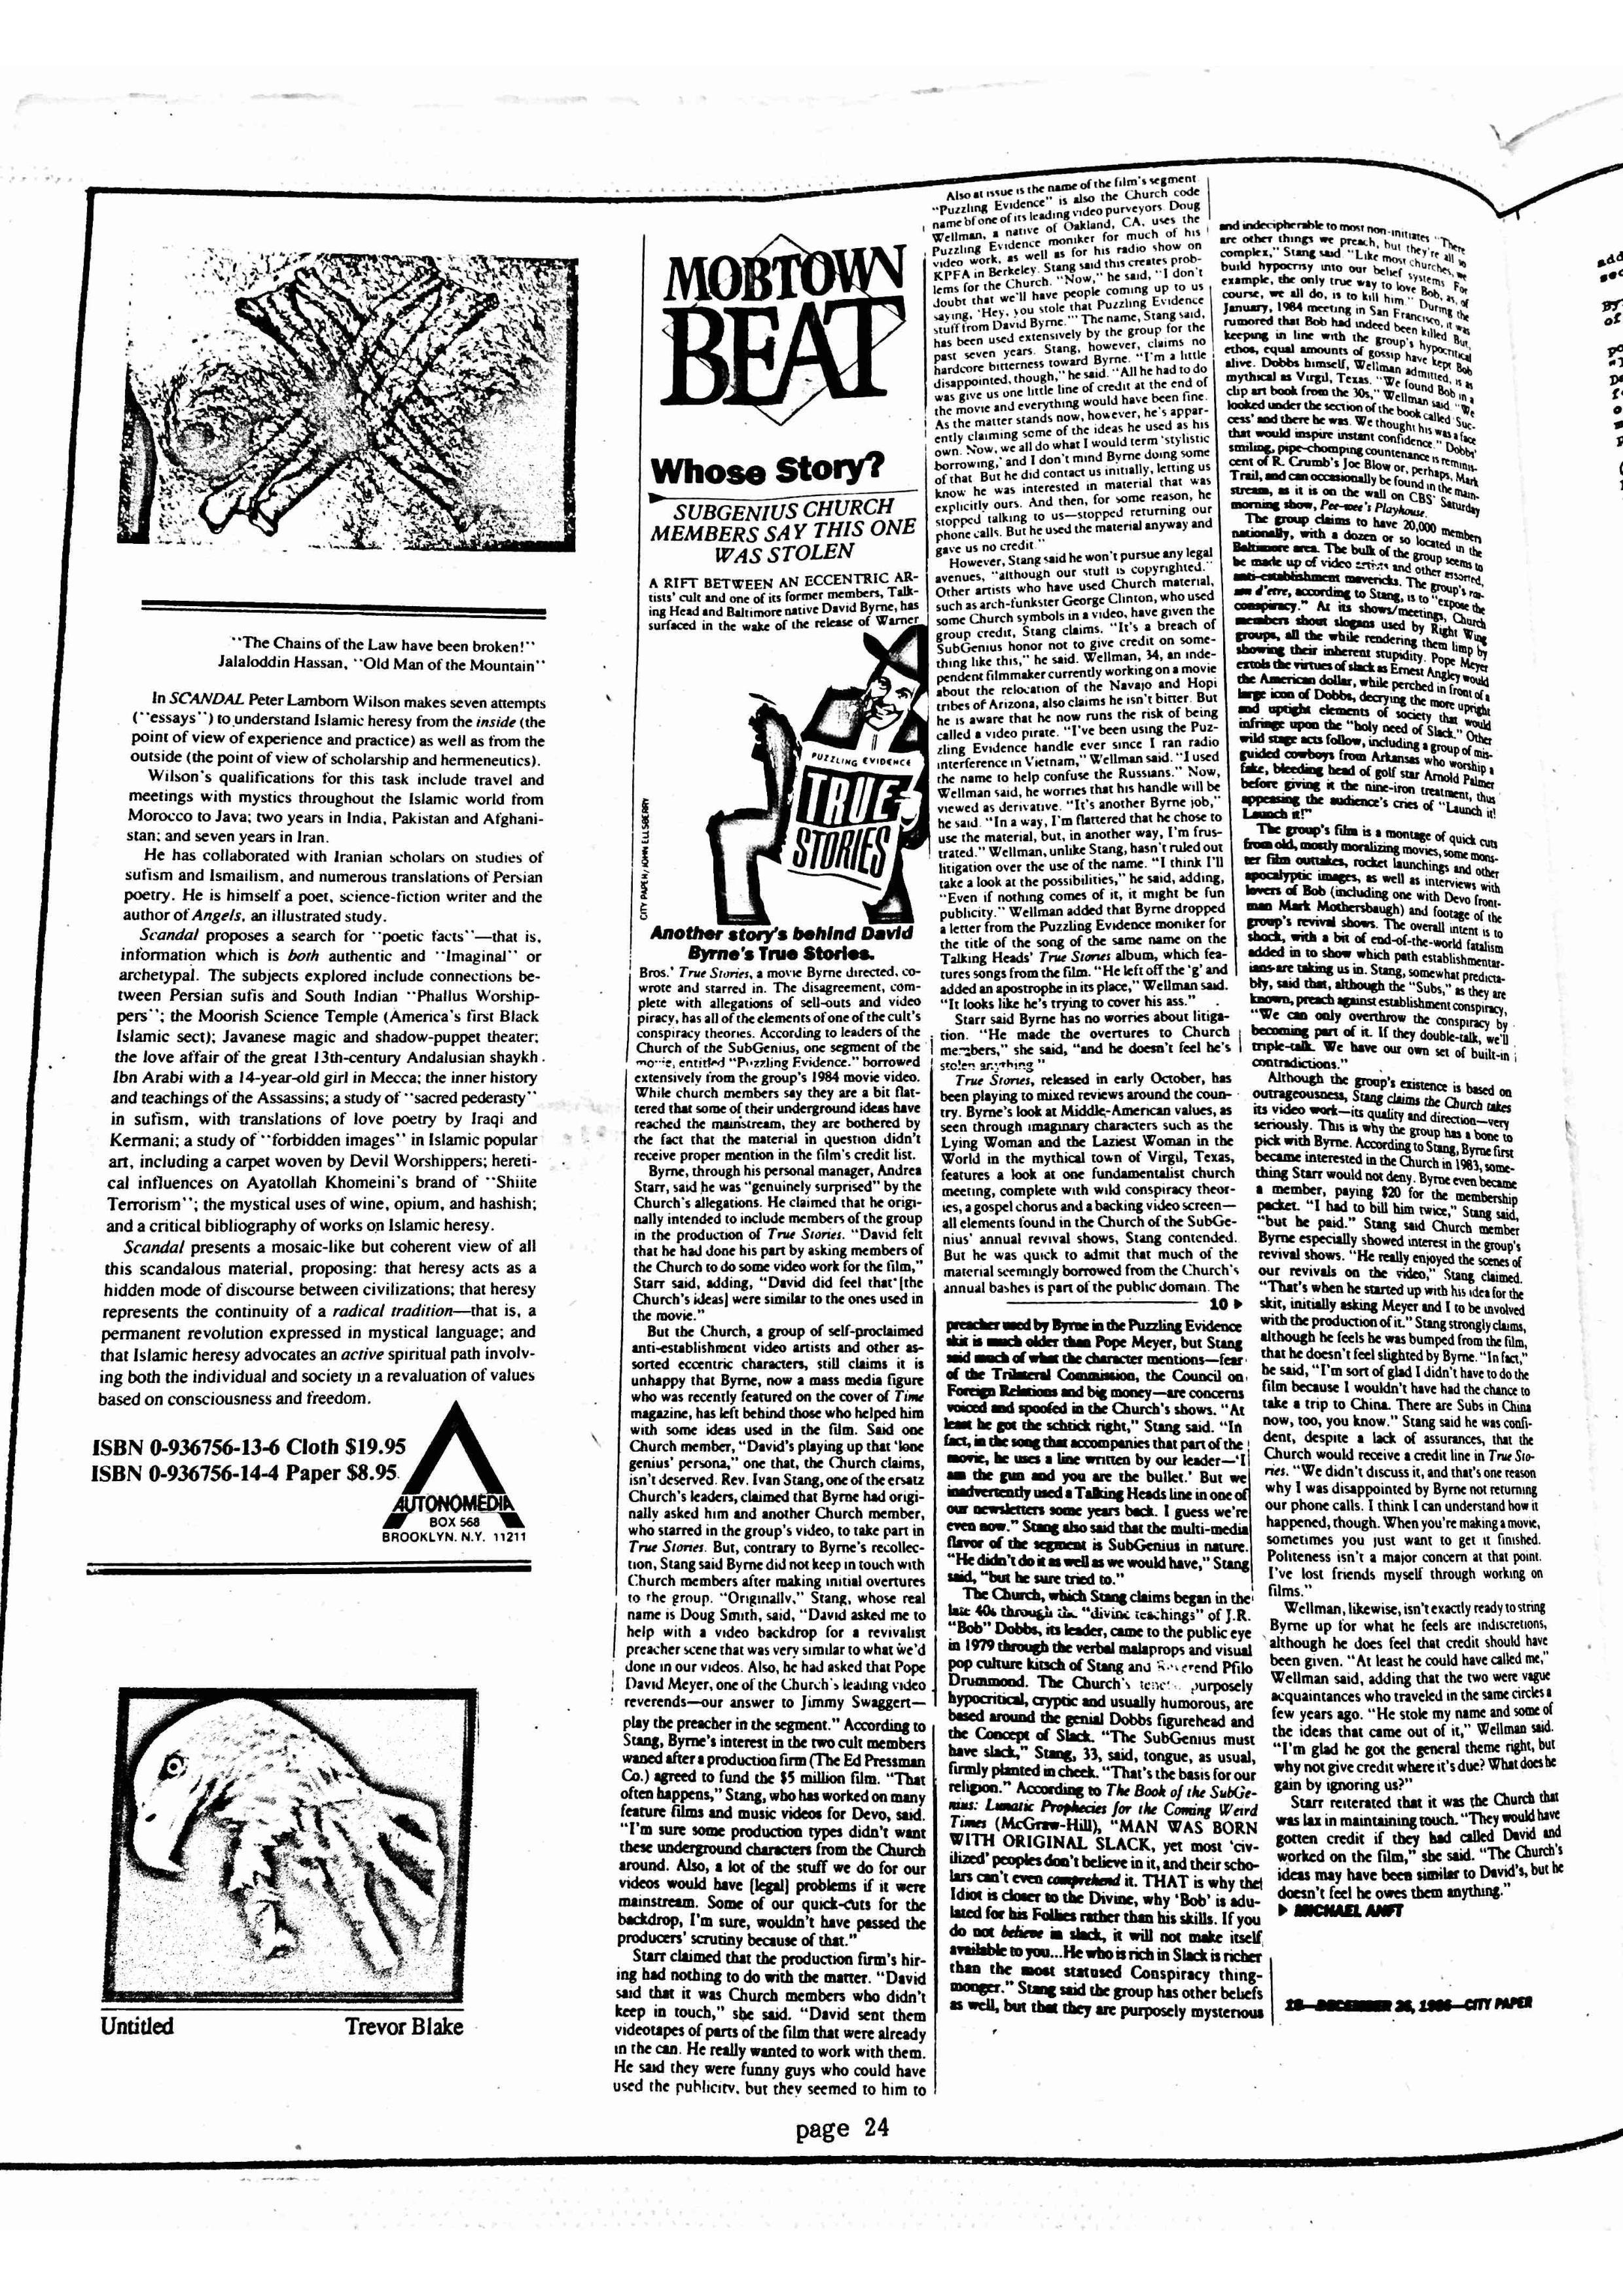 PopRealLast2-page-014.jpg